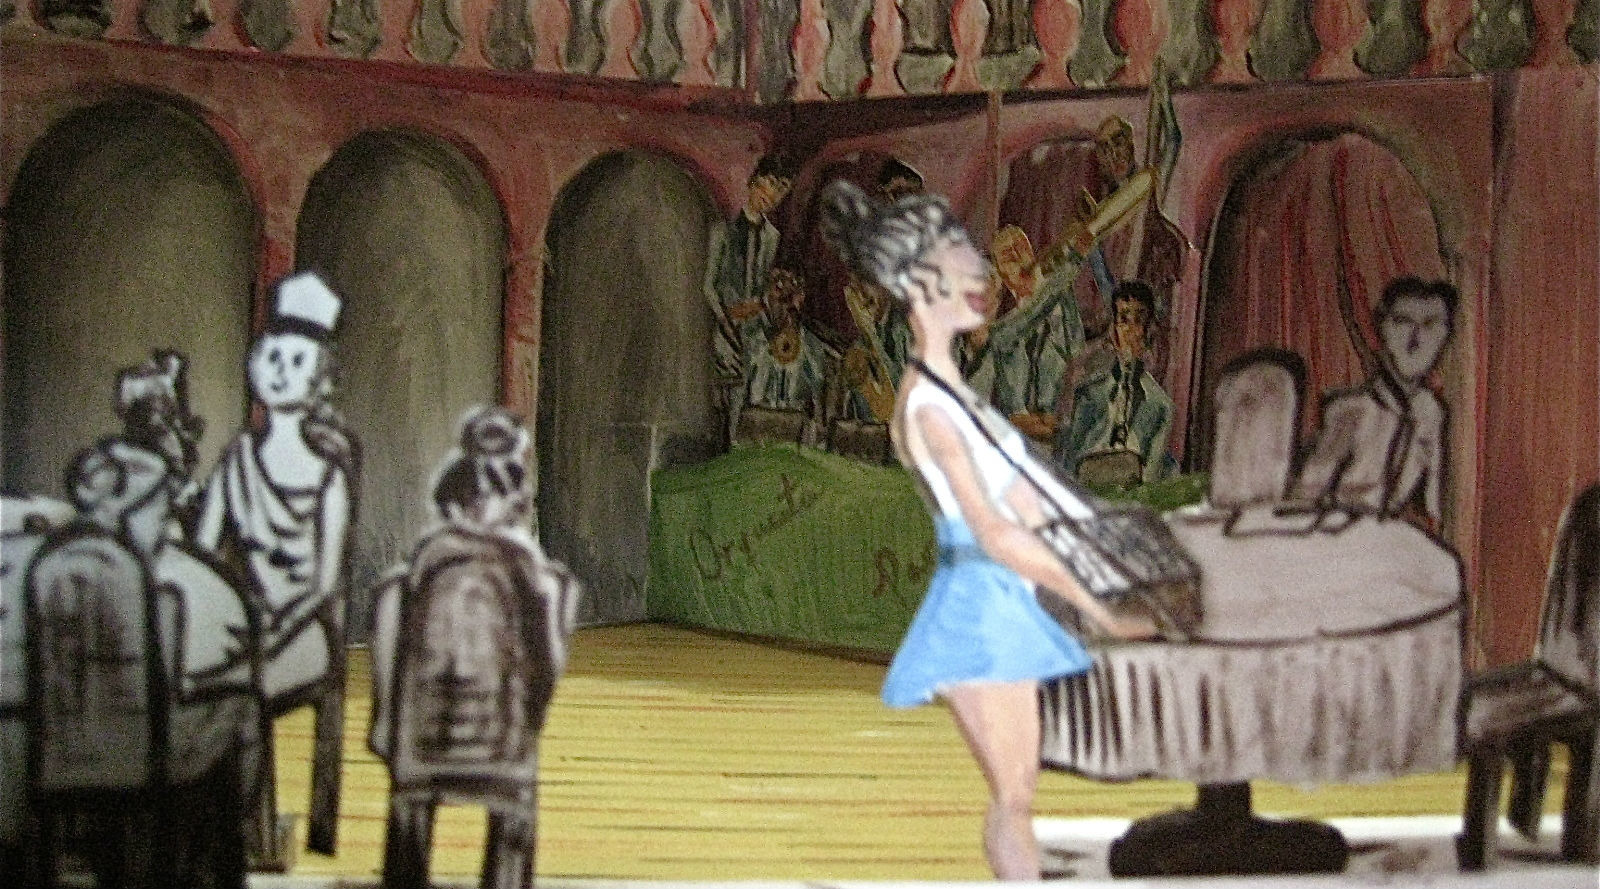 Teatro: Teatroscopio de banqueta